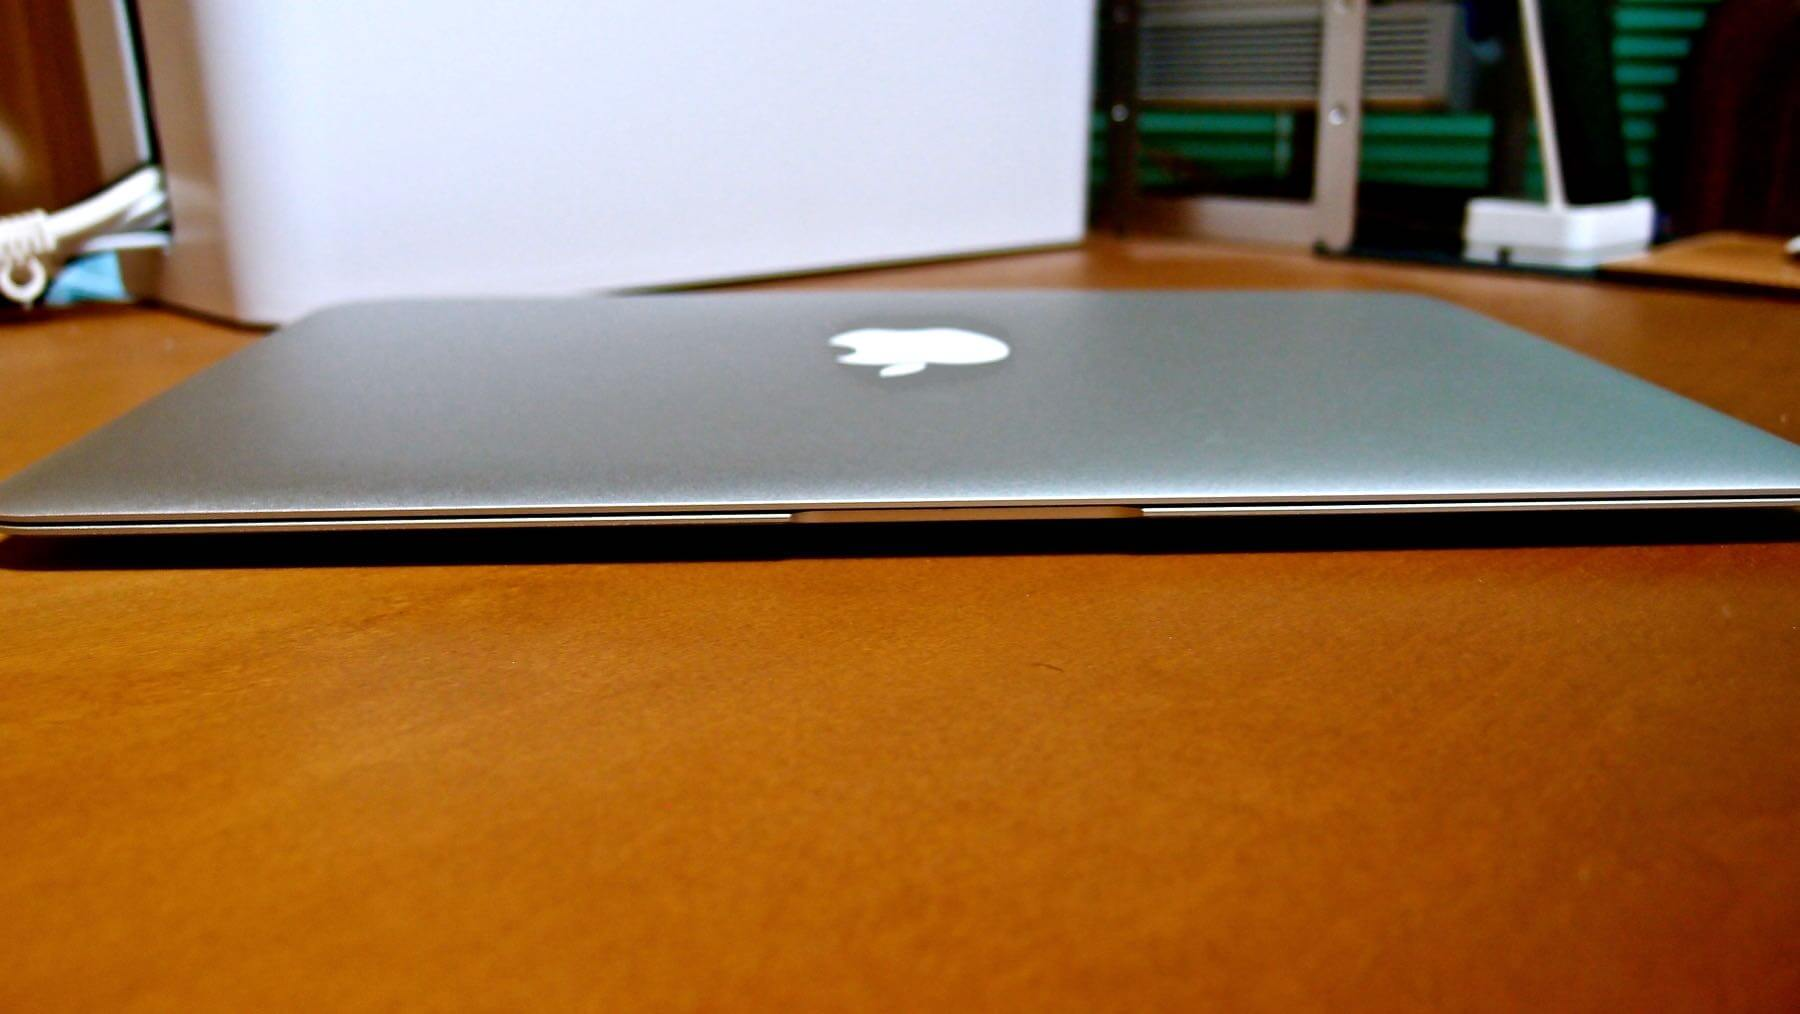 04 MacBook Air2013 Mid 11inch